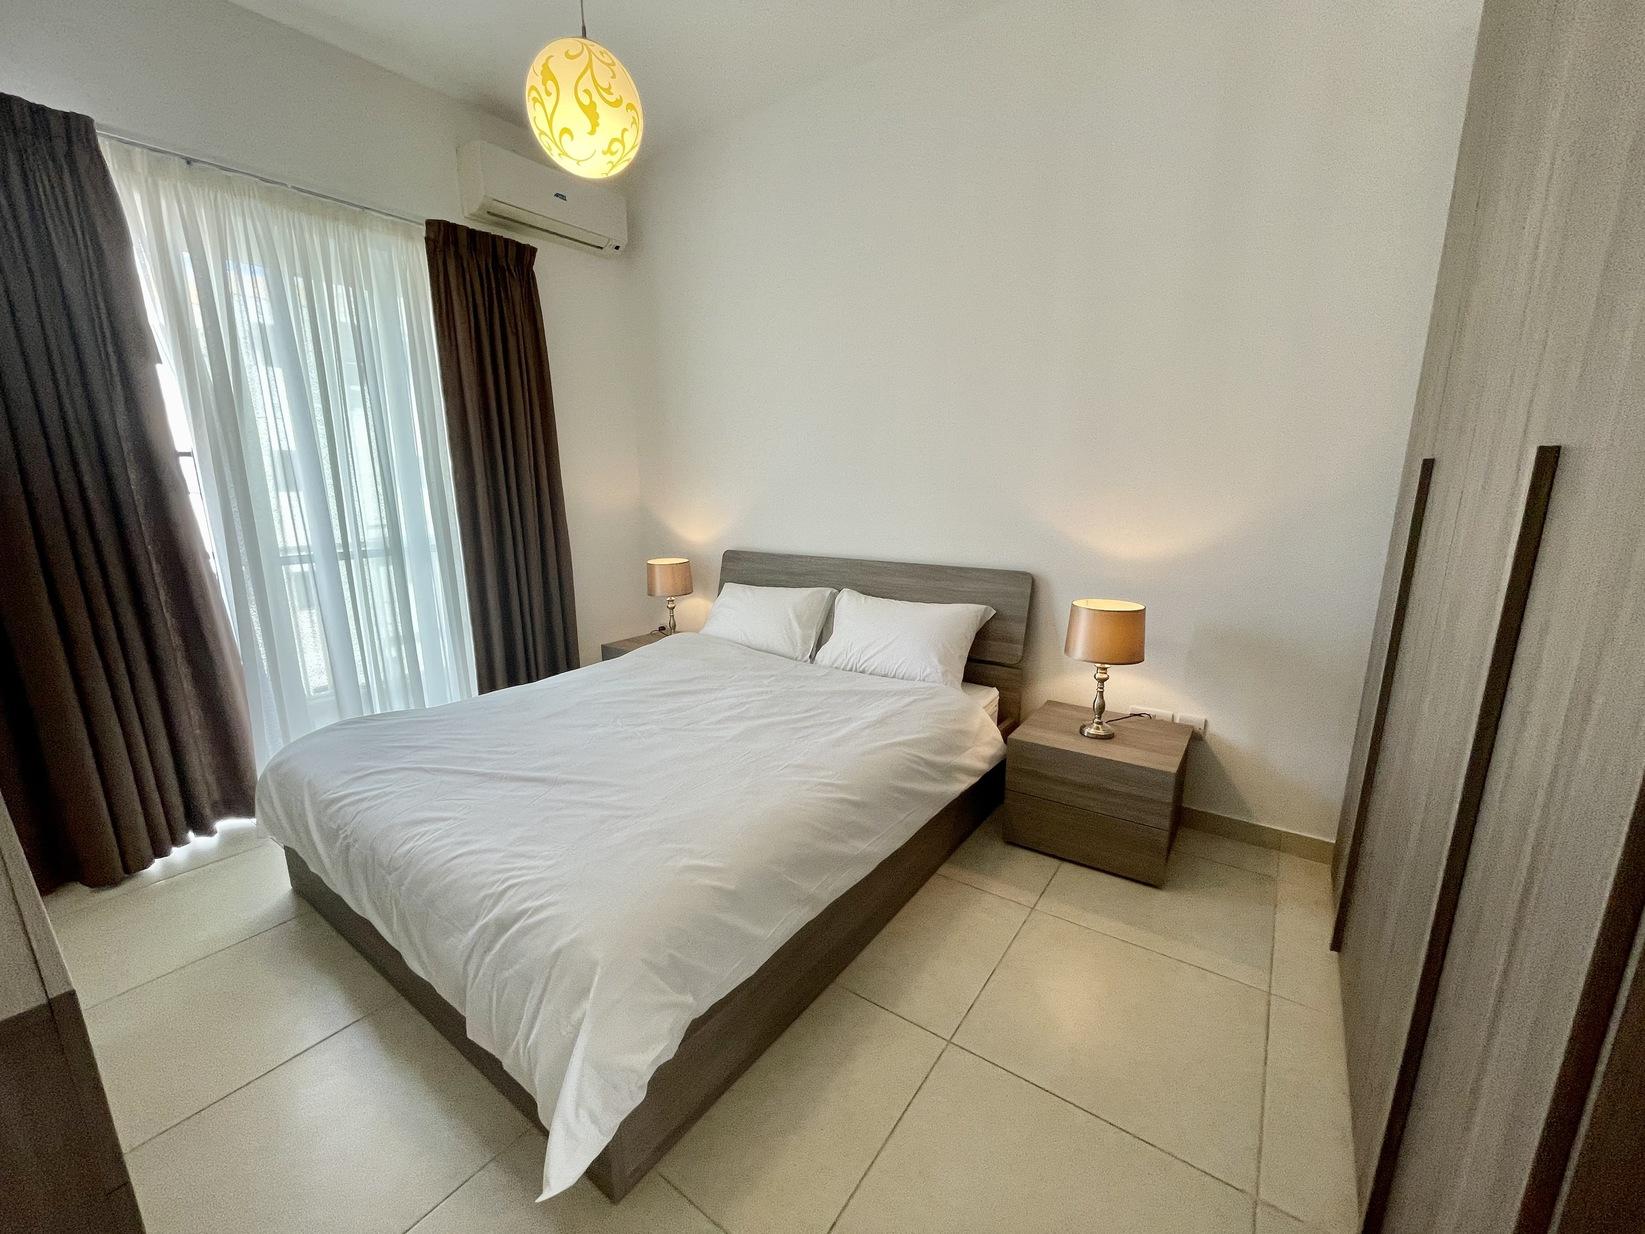 2 bed Penthouse For Rent in Gzira, Gzira - thumb 9